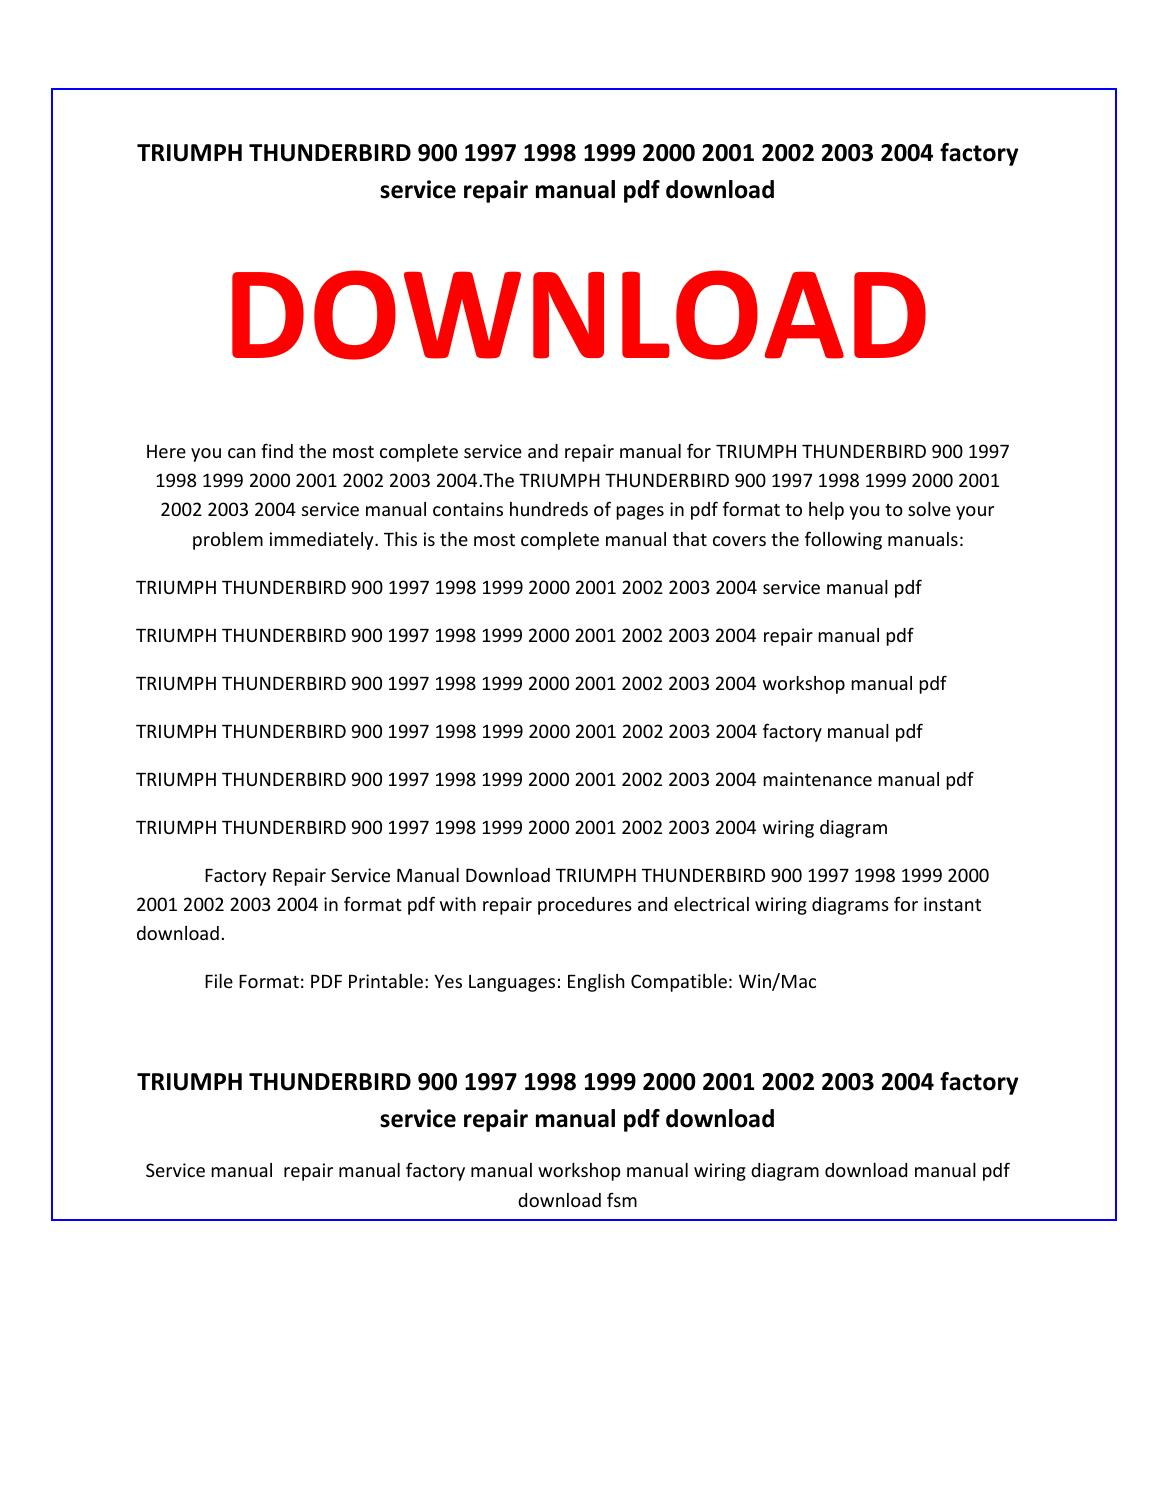 triumph thunderbird 900 1997 1998 1999 2000 2001 2002 2003 2004 service  repair manual by service manual - issuu